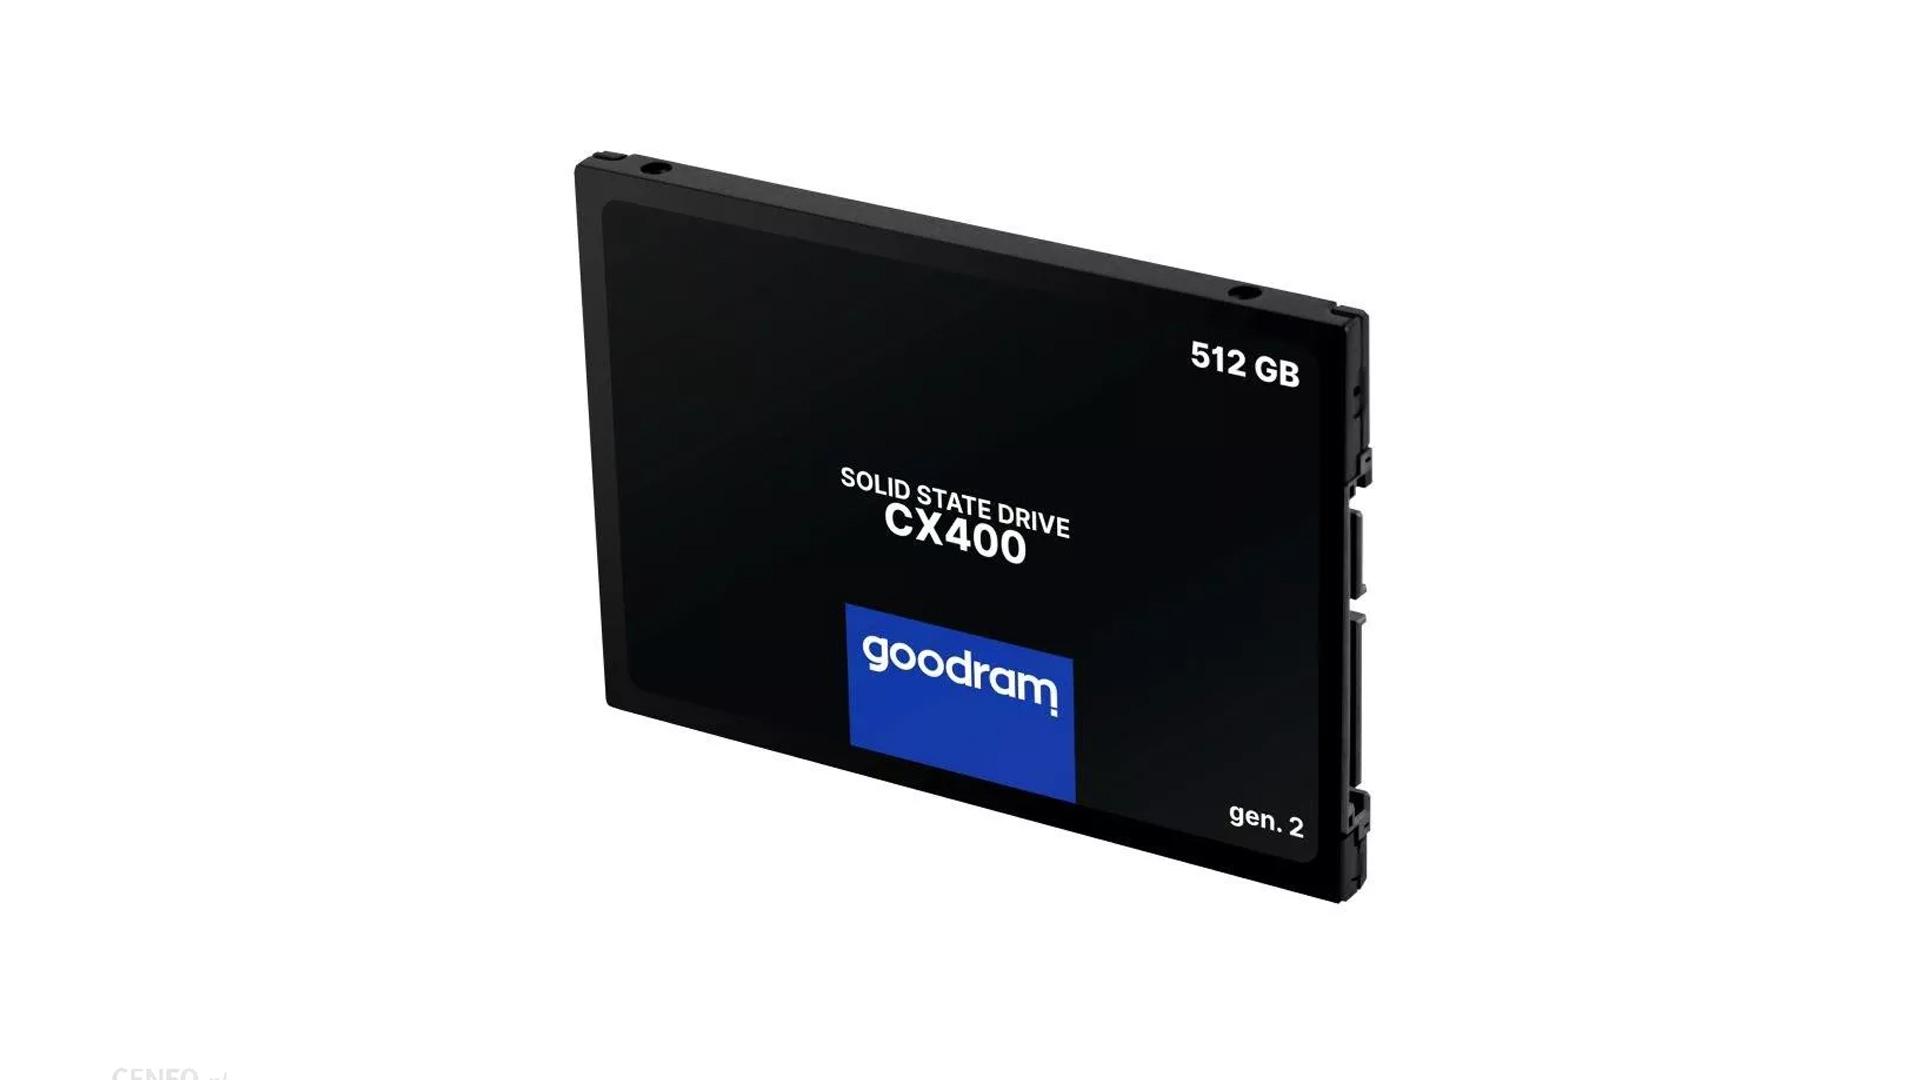 cx400_512_3